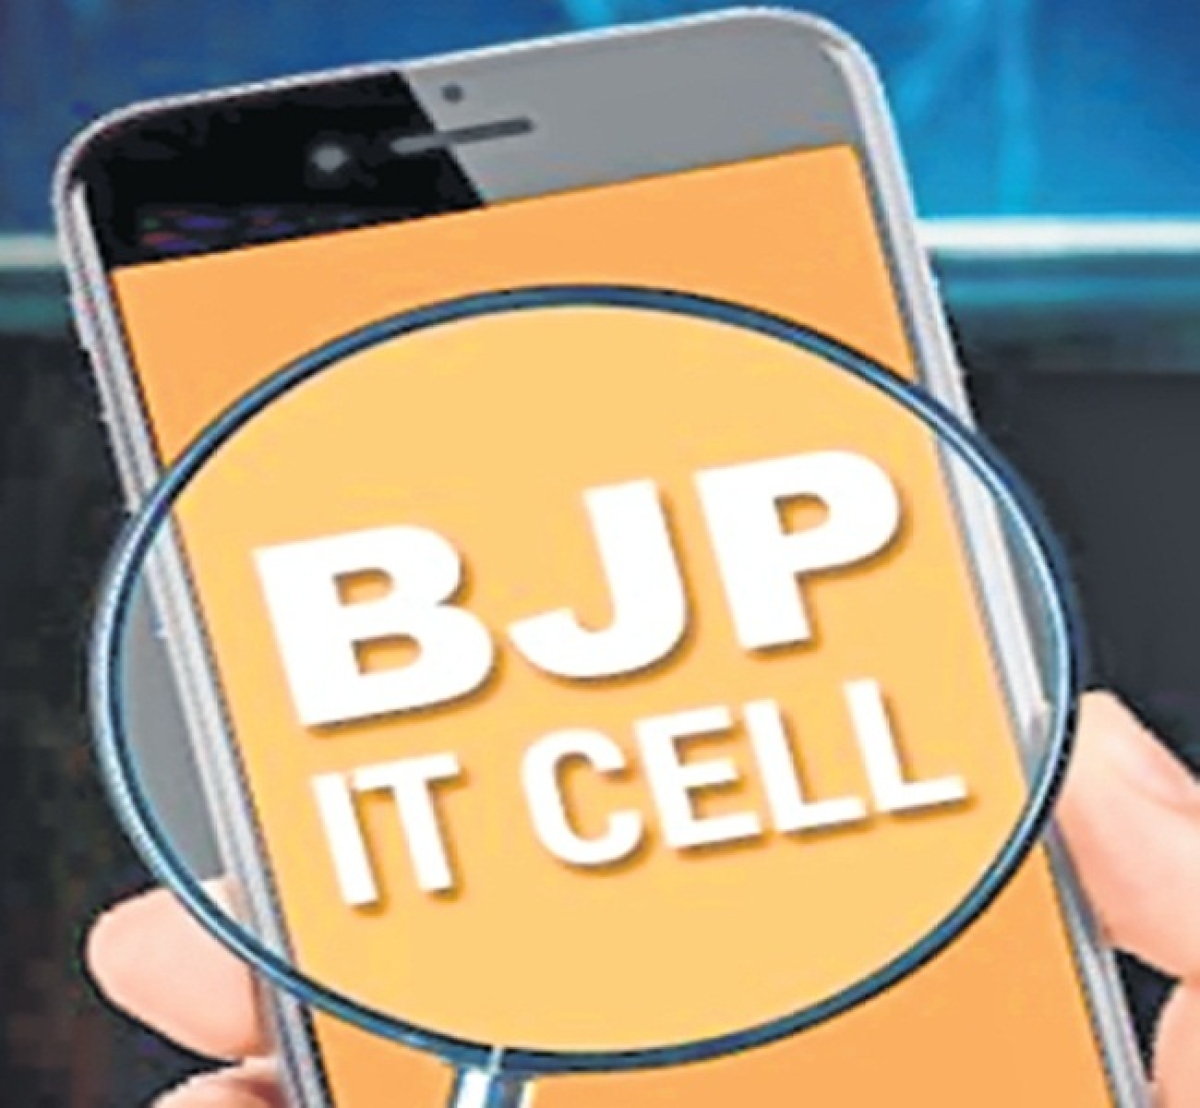 Anti-Modi tweets: BJP's 'Silencer' moment